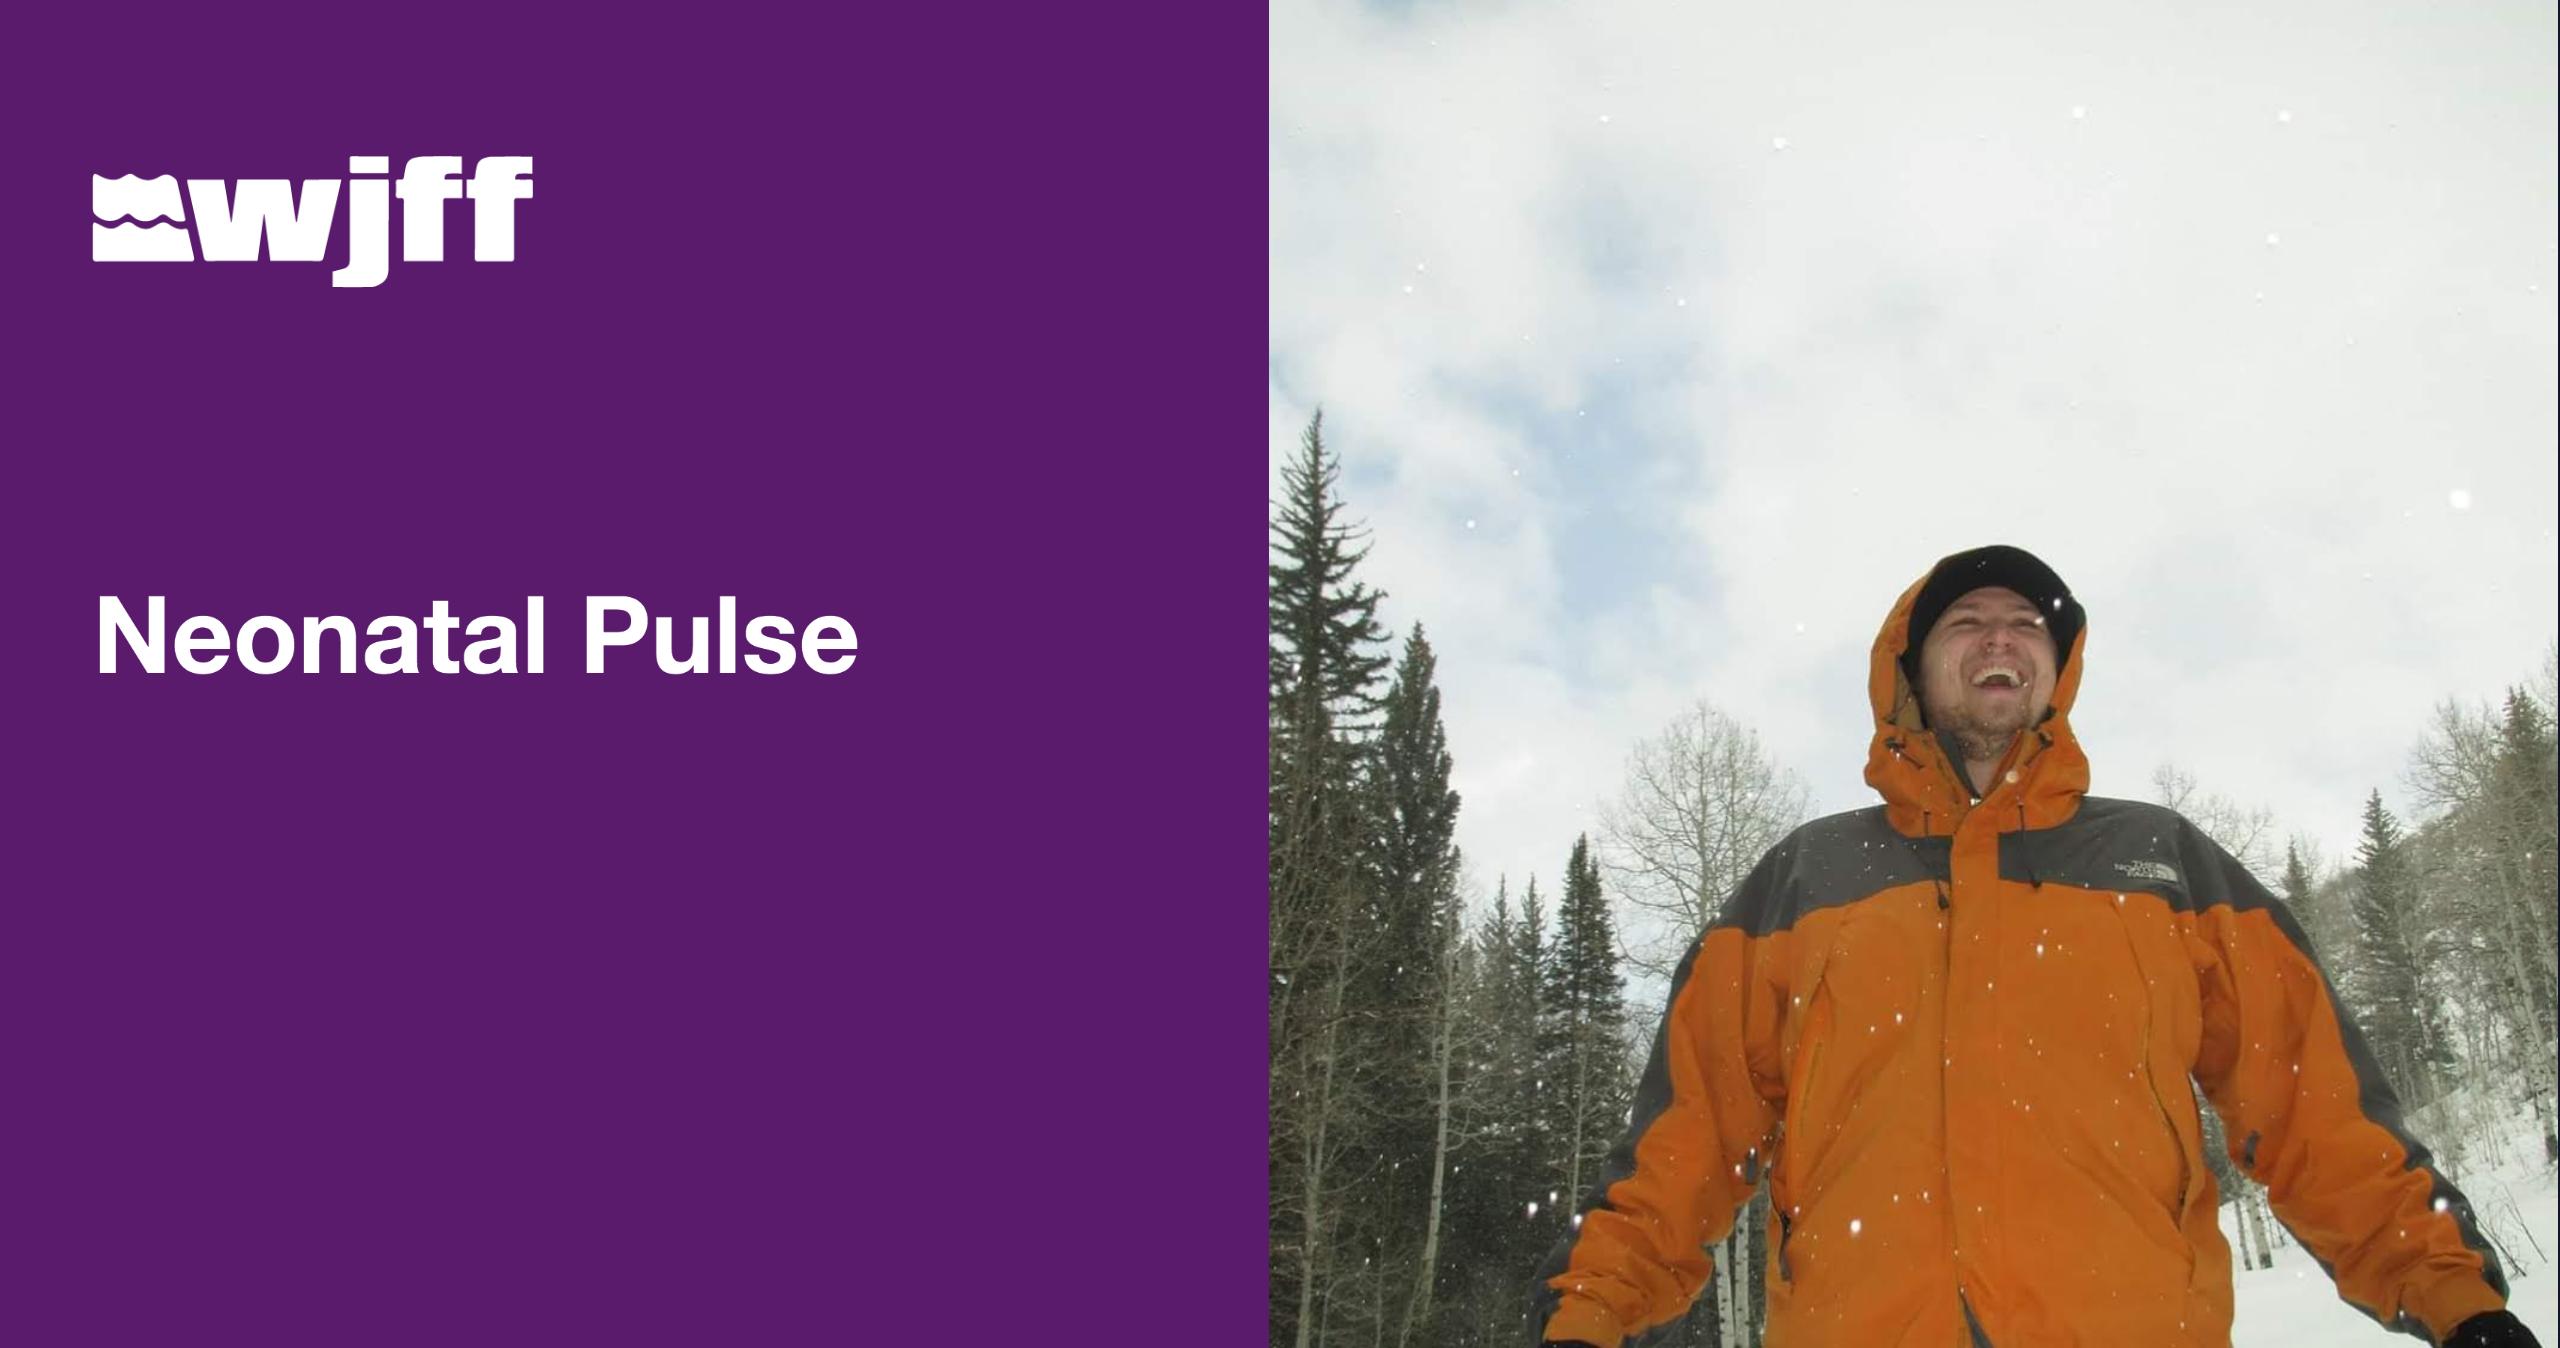 Neonatal Pulse